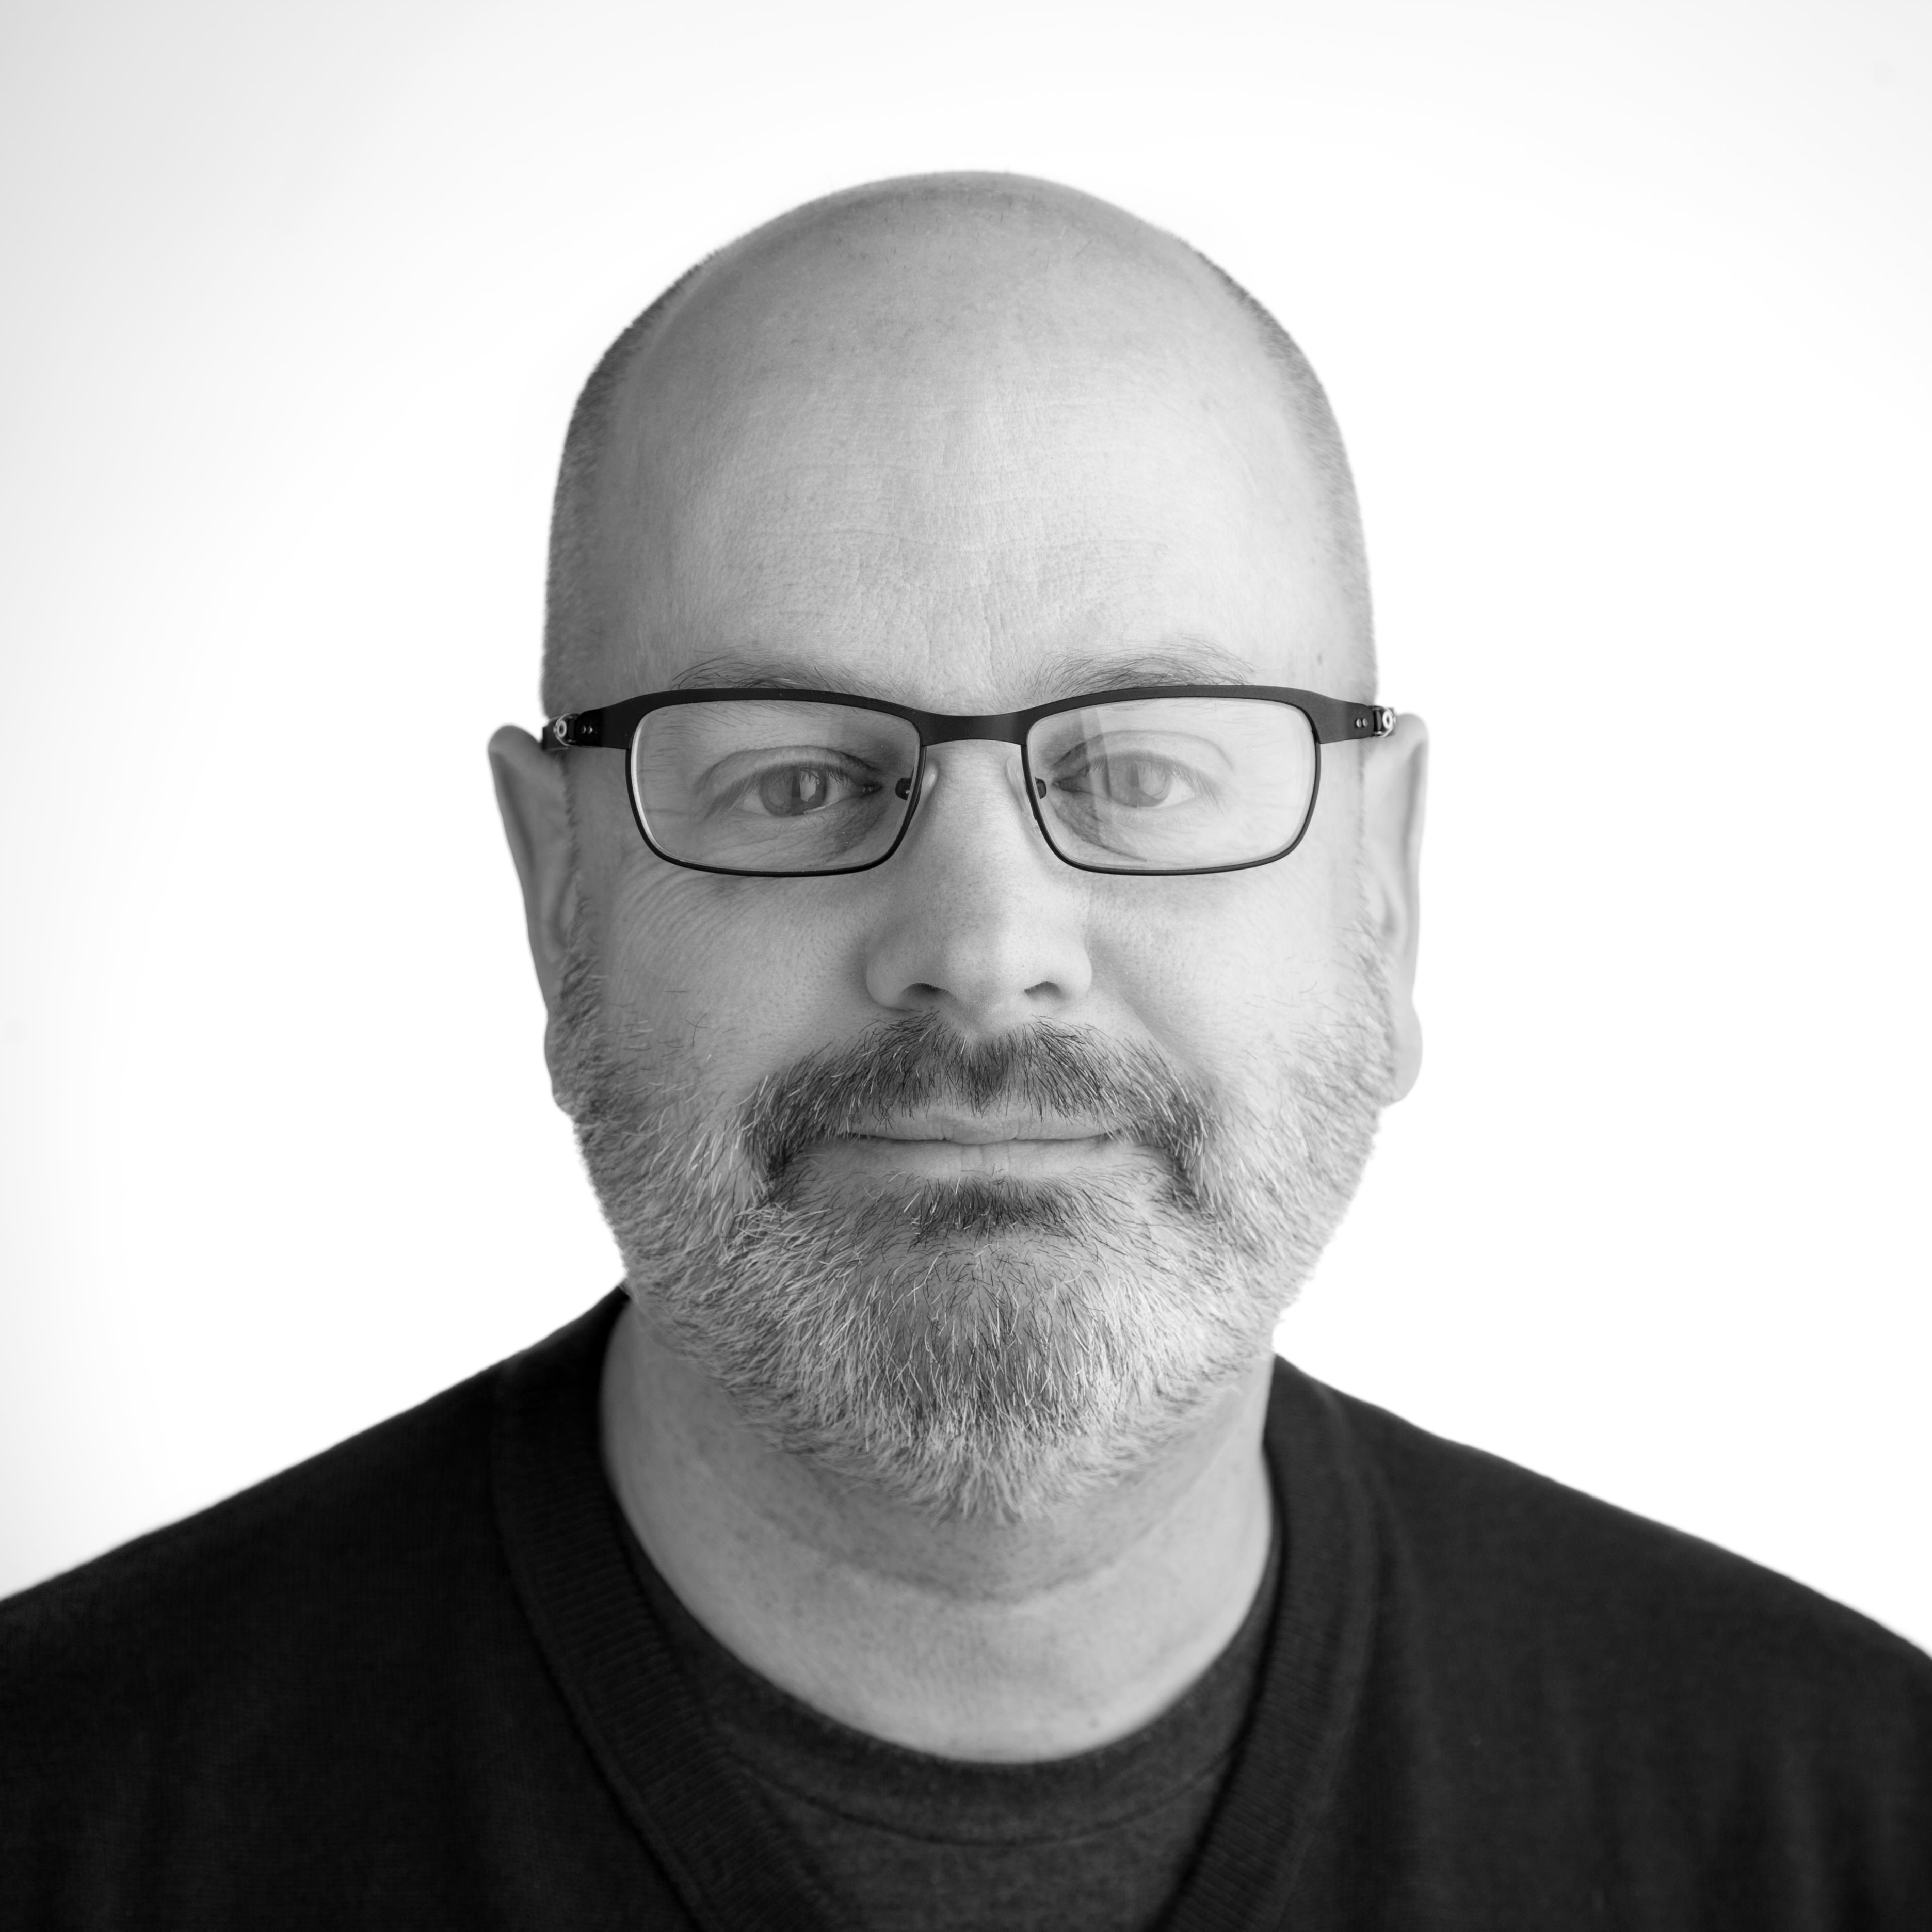 Rick Gardinier